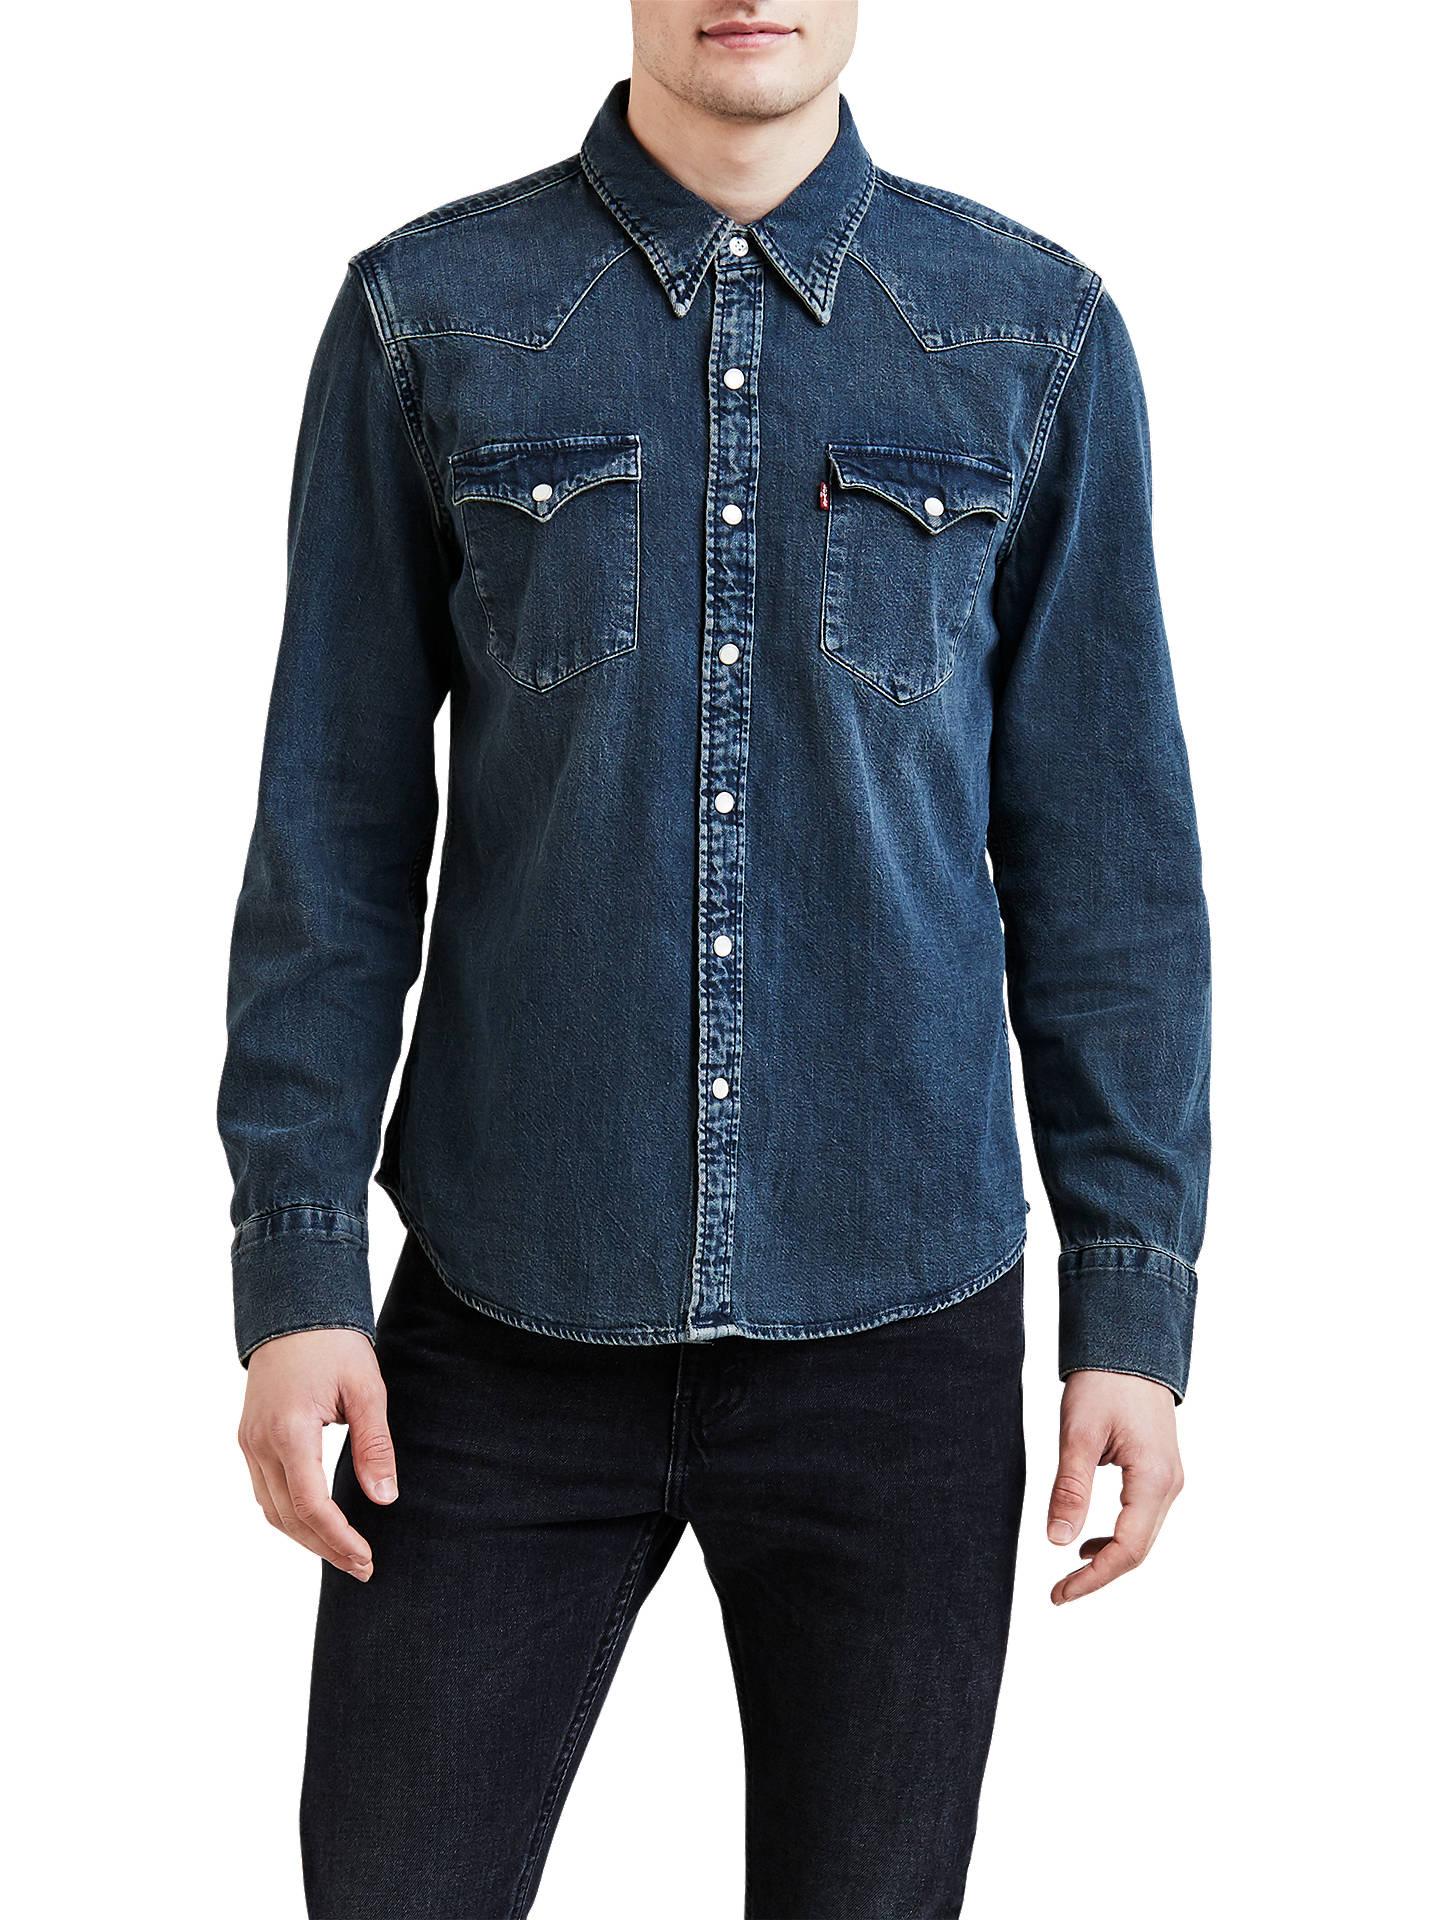 8d1df1b304 Buy Levi s Barstow Western Denim Shirt